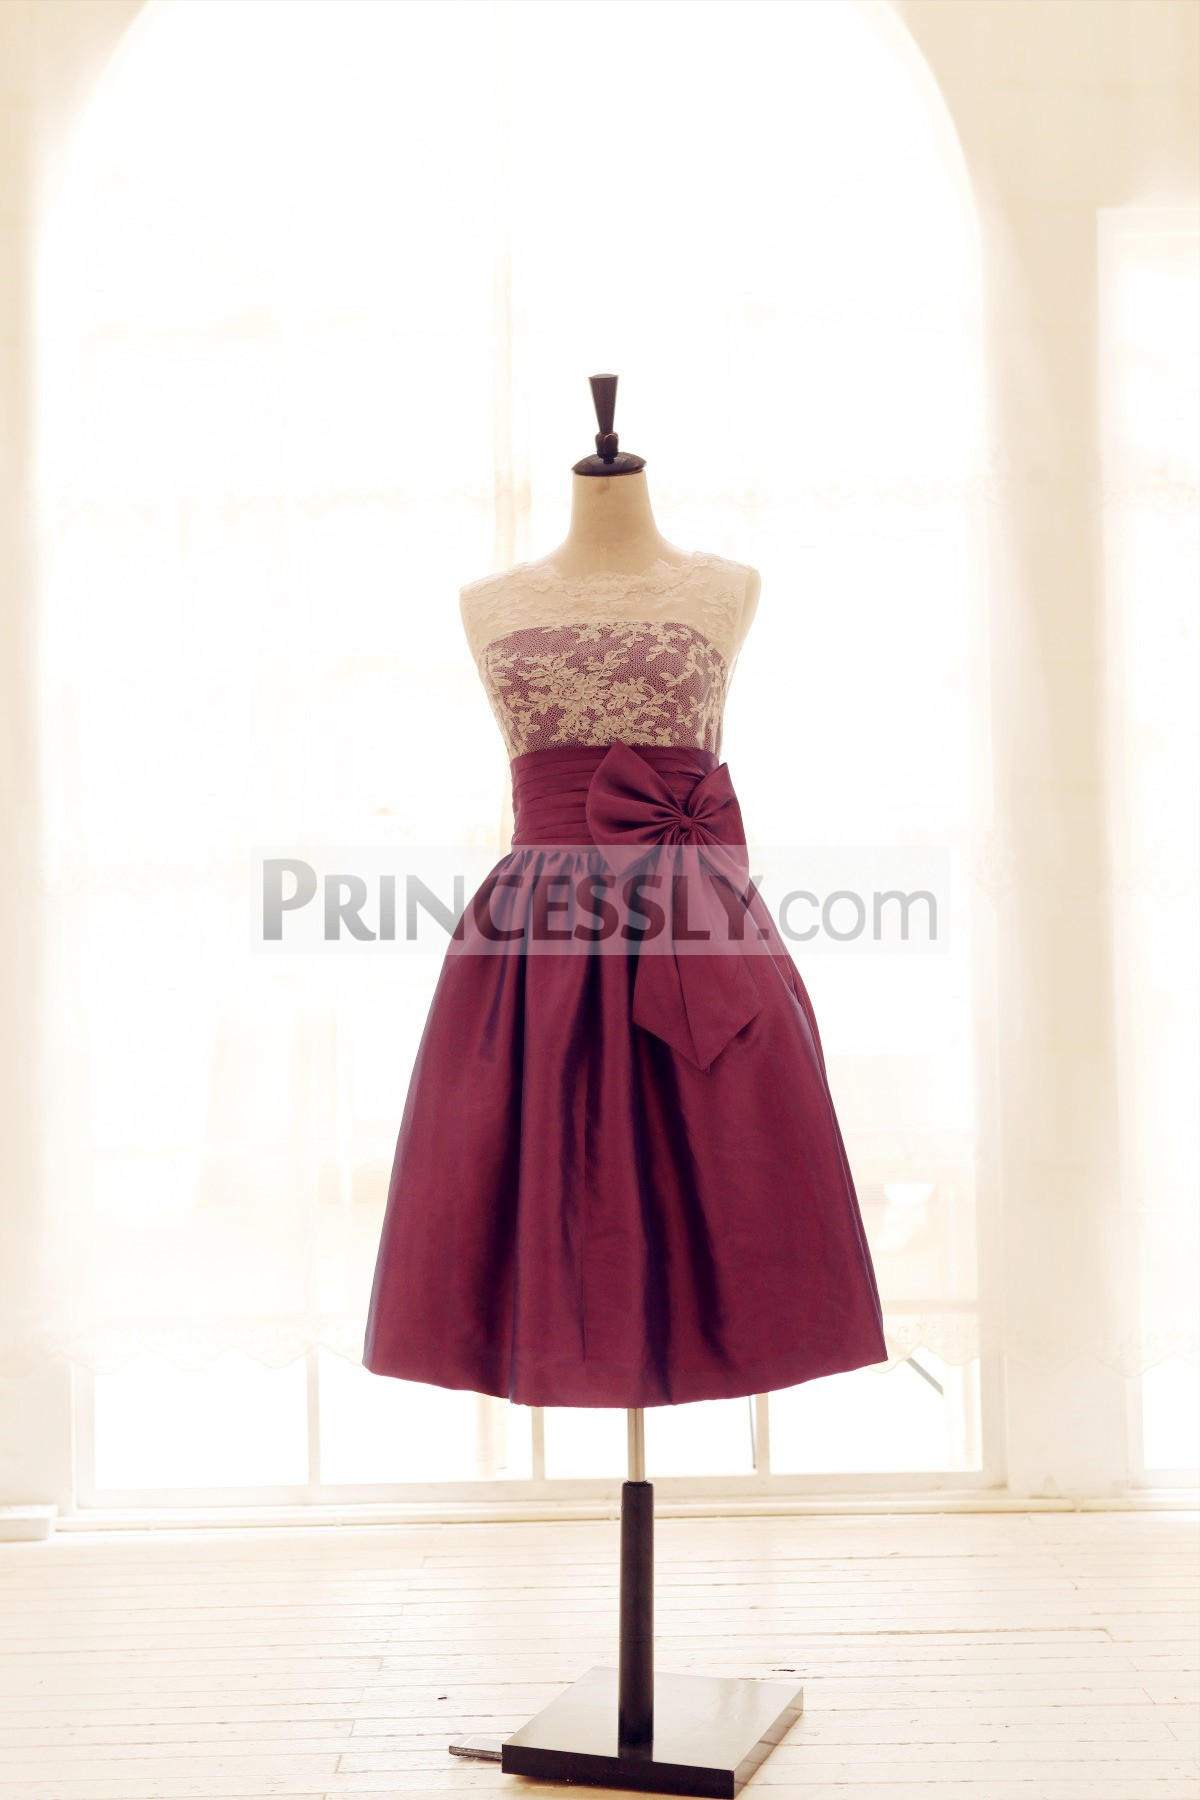 Princessly.com-K1001959-Lace Taffeta Bridesmaid Dress In knee Short Length-Dark Purple Color-31